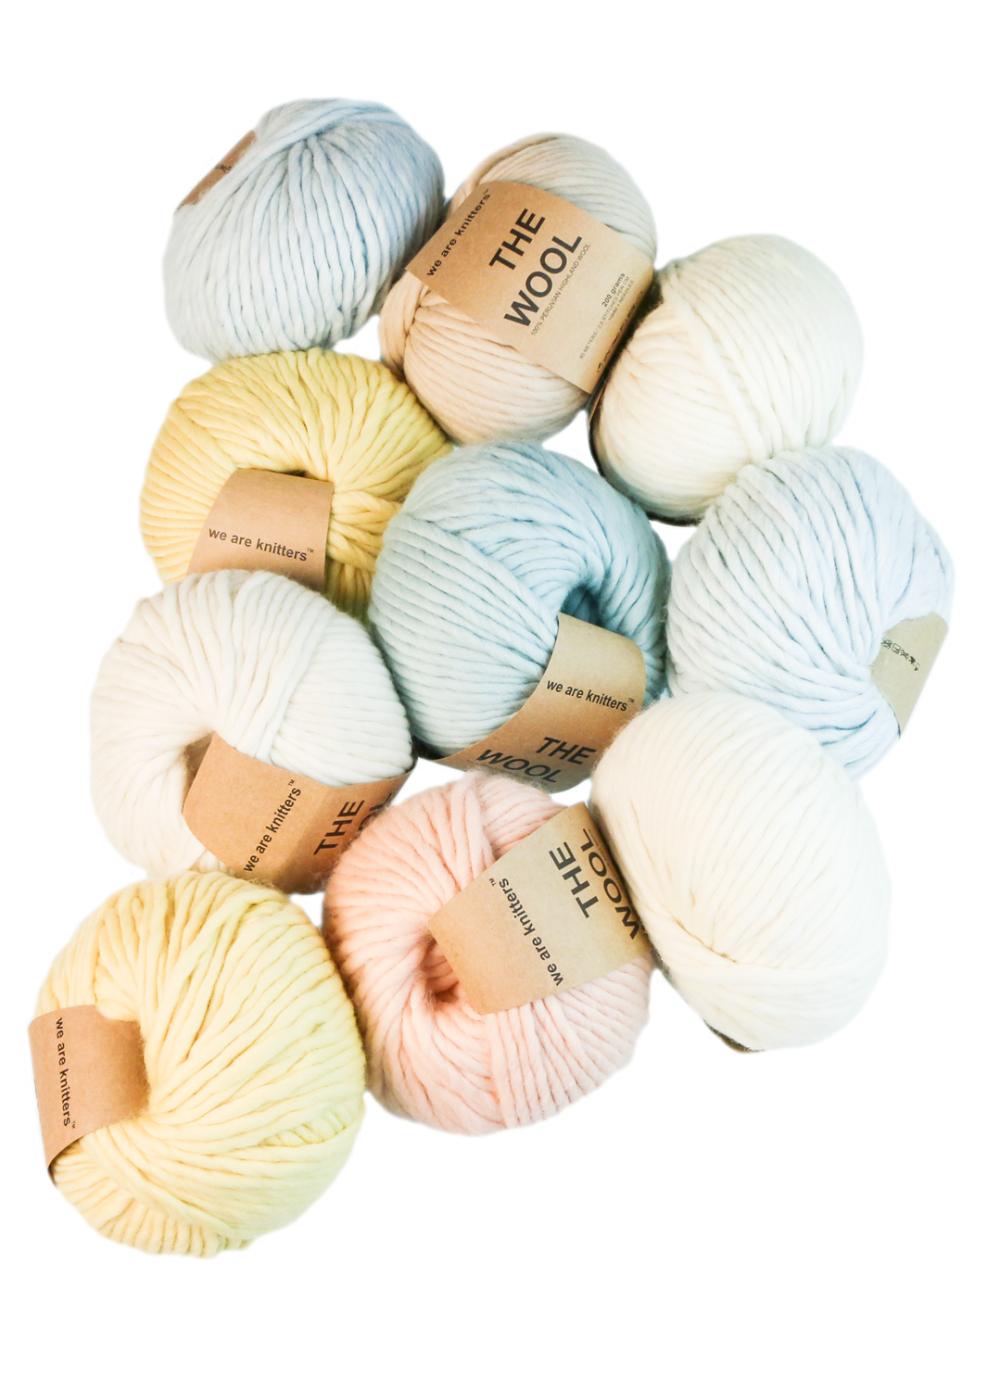 10 100 Peruvian Wool Yarn Ball In 2021 Yarn Ball Yarn Thick Wool Yarn